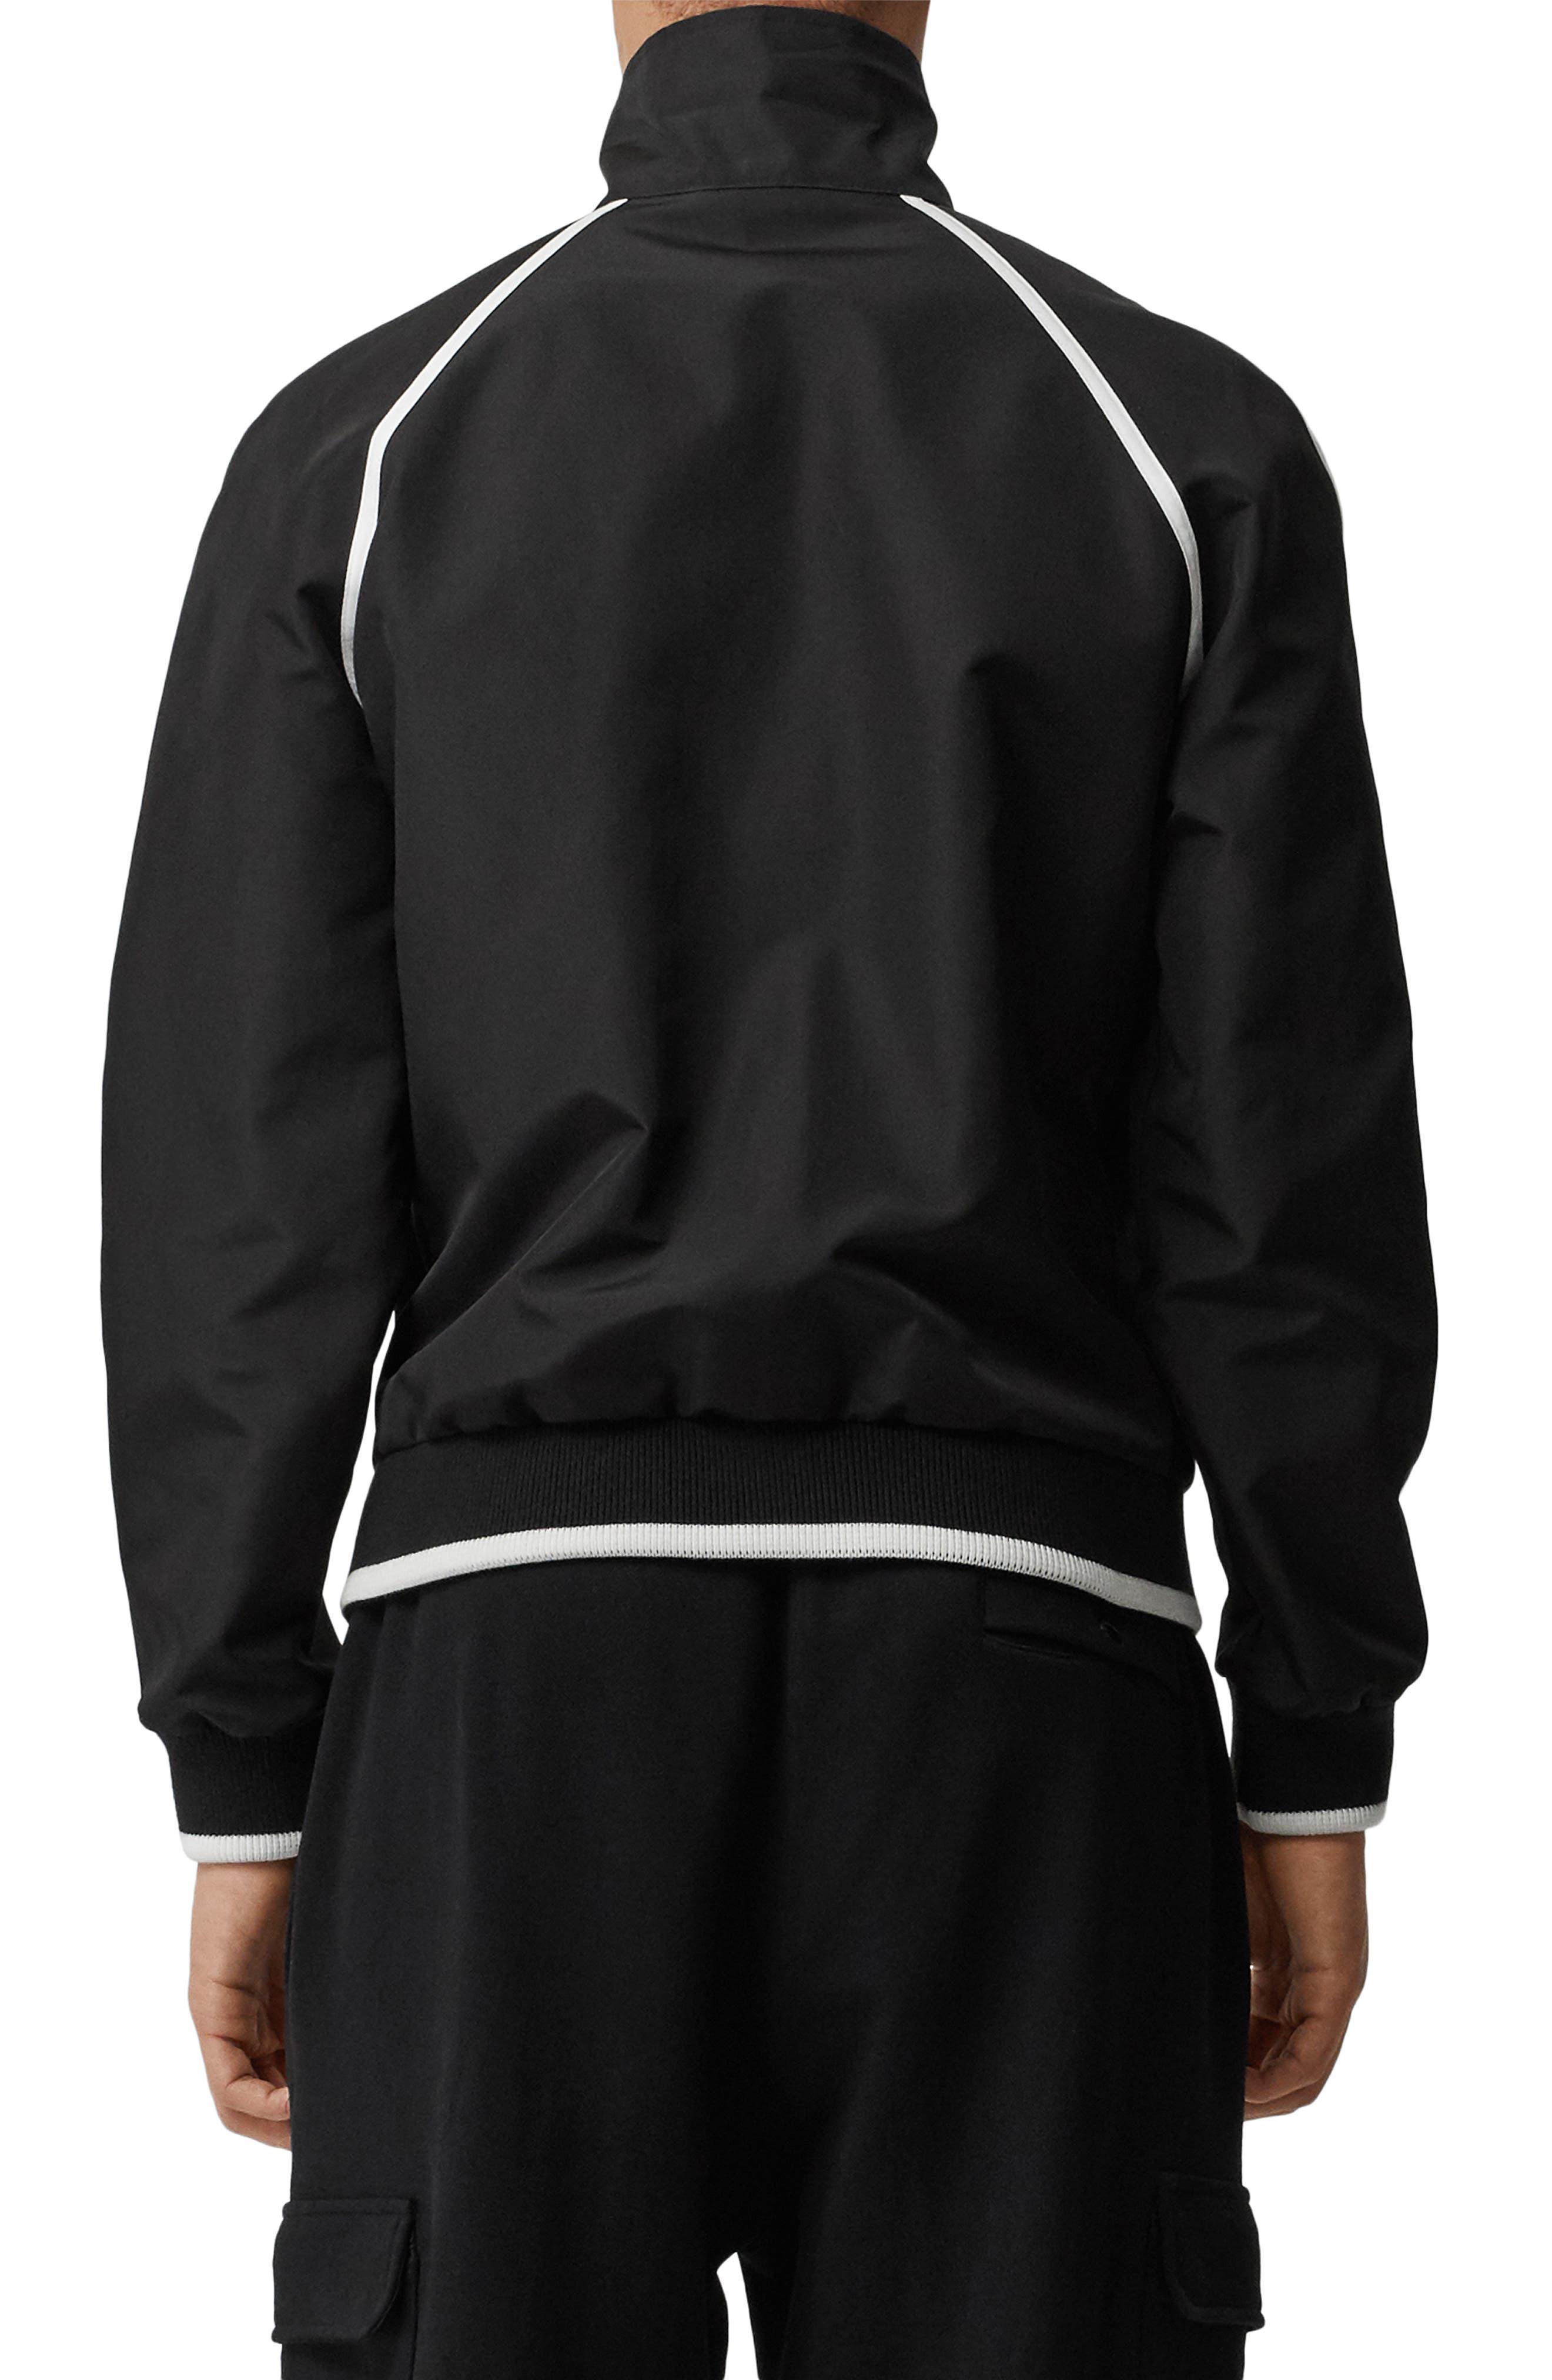 BURBERRY, Northfield Nylon Track Jacket, Alternate thumbnail 2, color, BLACK